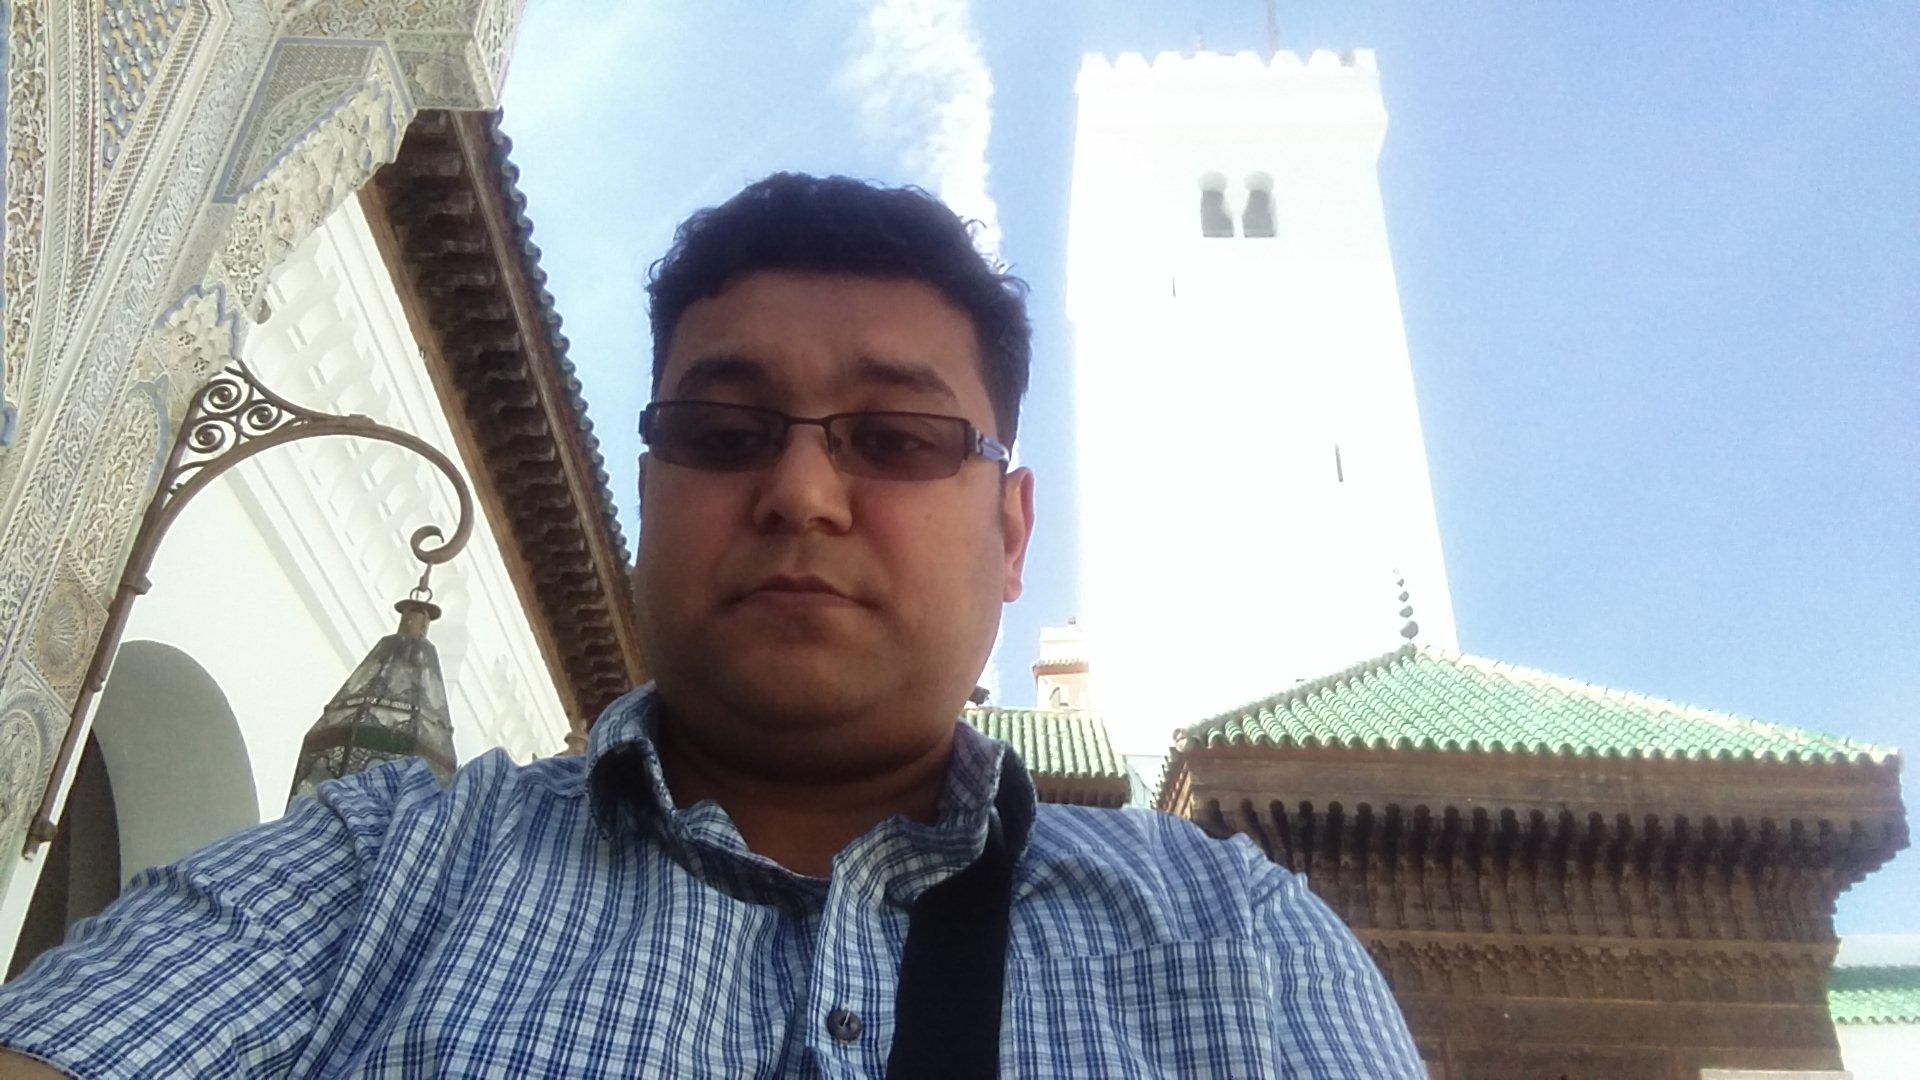 Masjid Al-Qarawiyyin